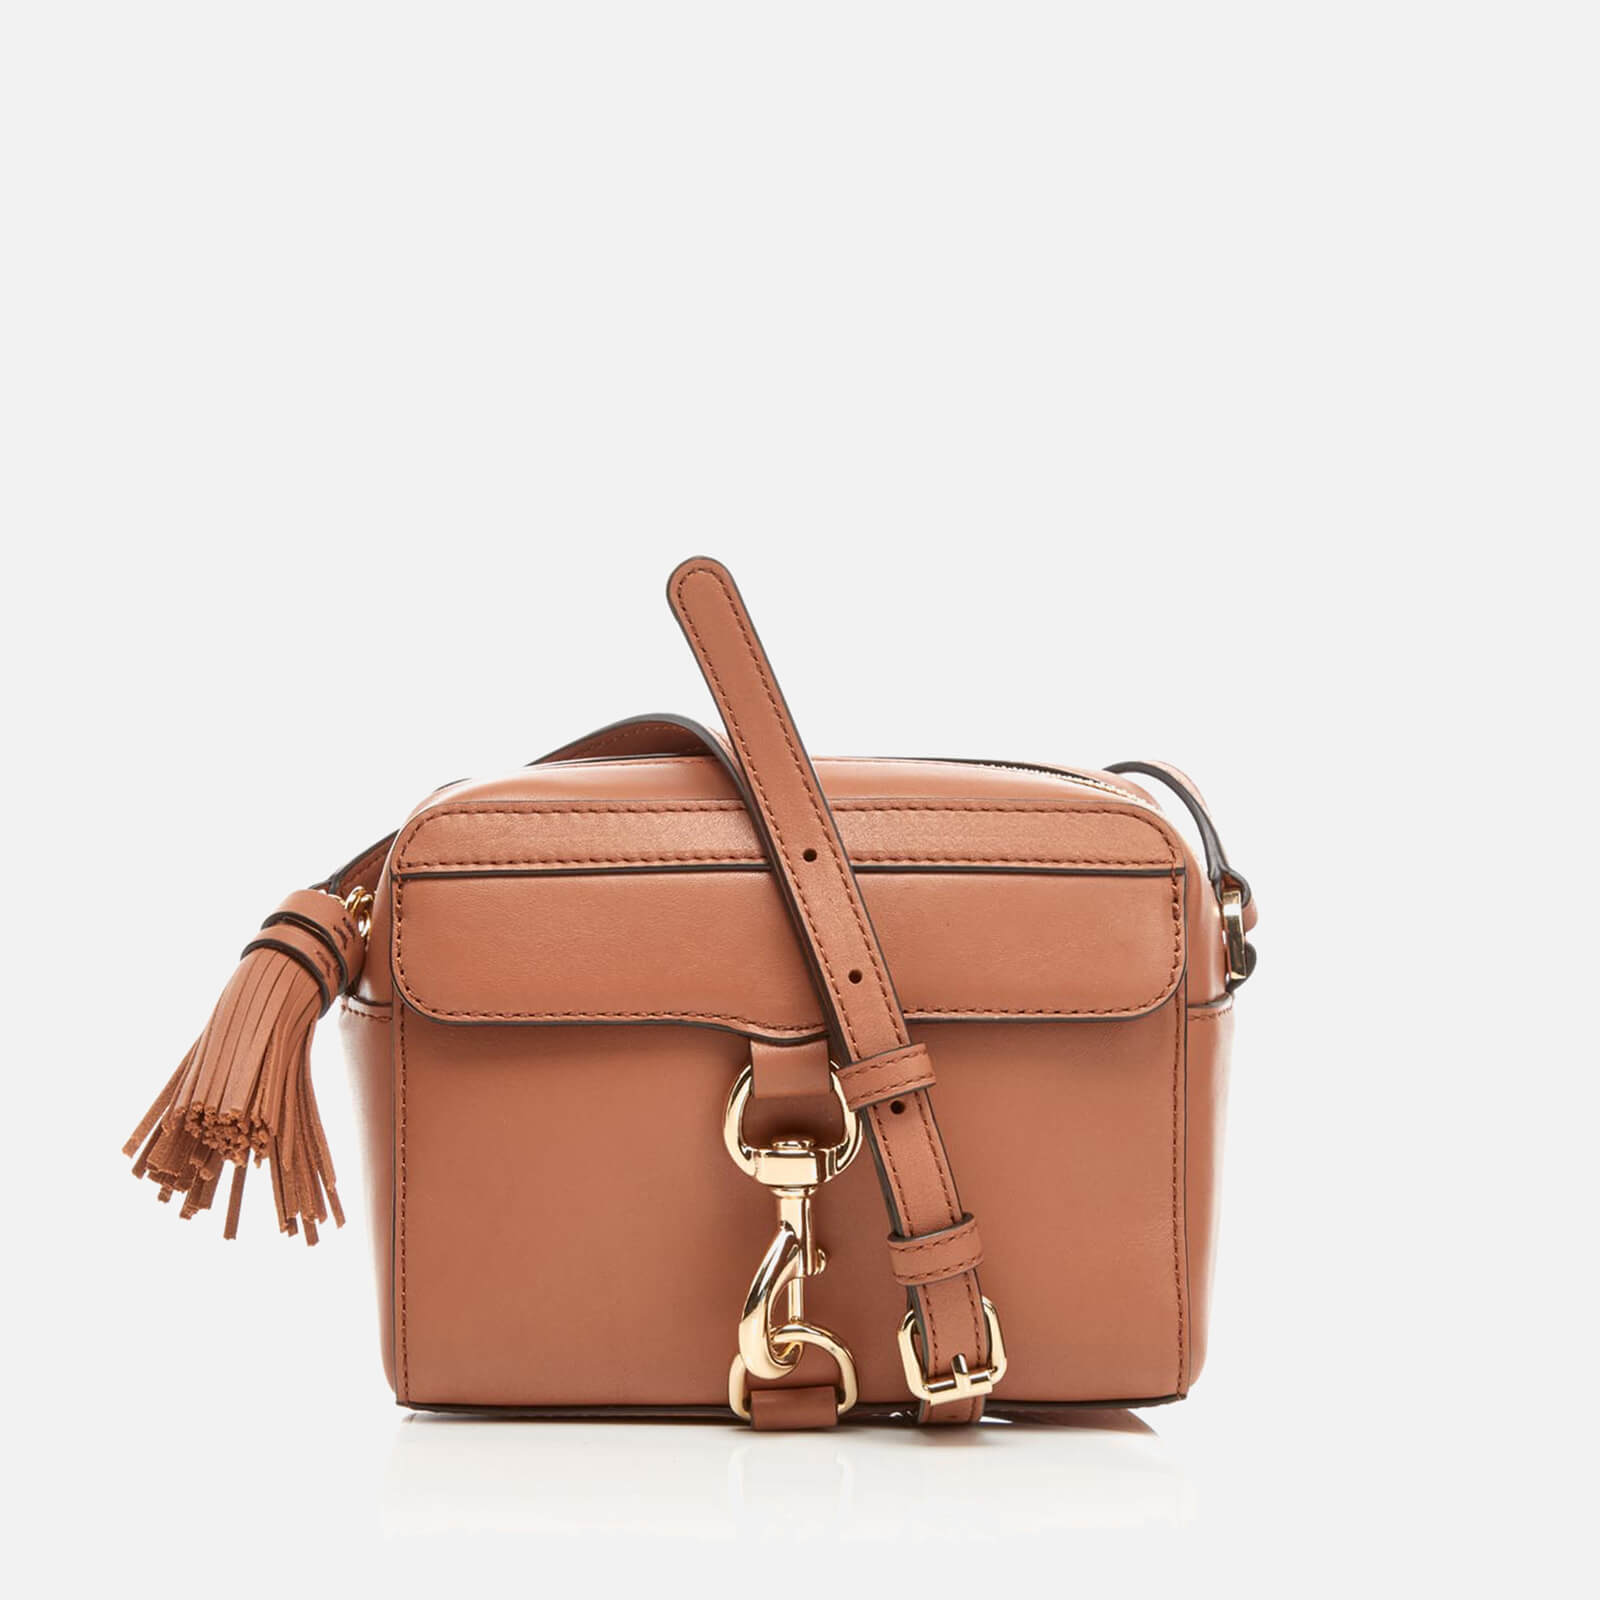 6867b3cf53 Rebecca Minkoff Women s M.A.B Camera Bag - Almond - Free UK Delivery over  £50